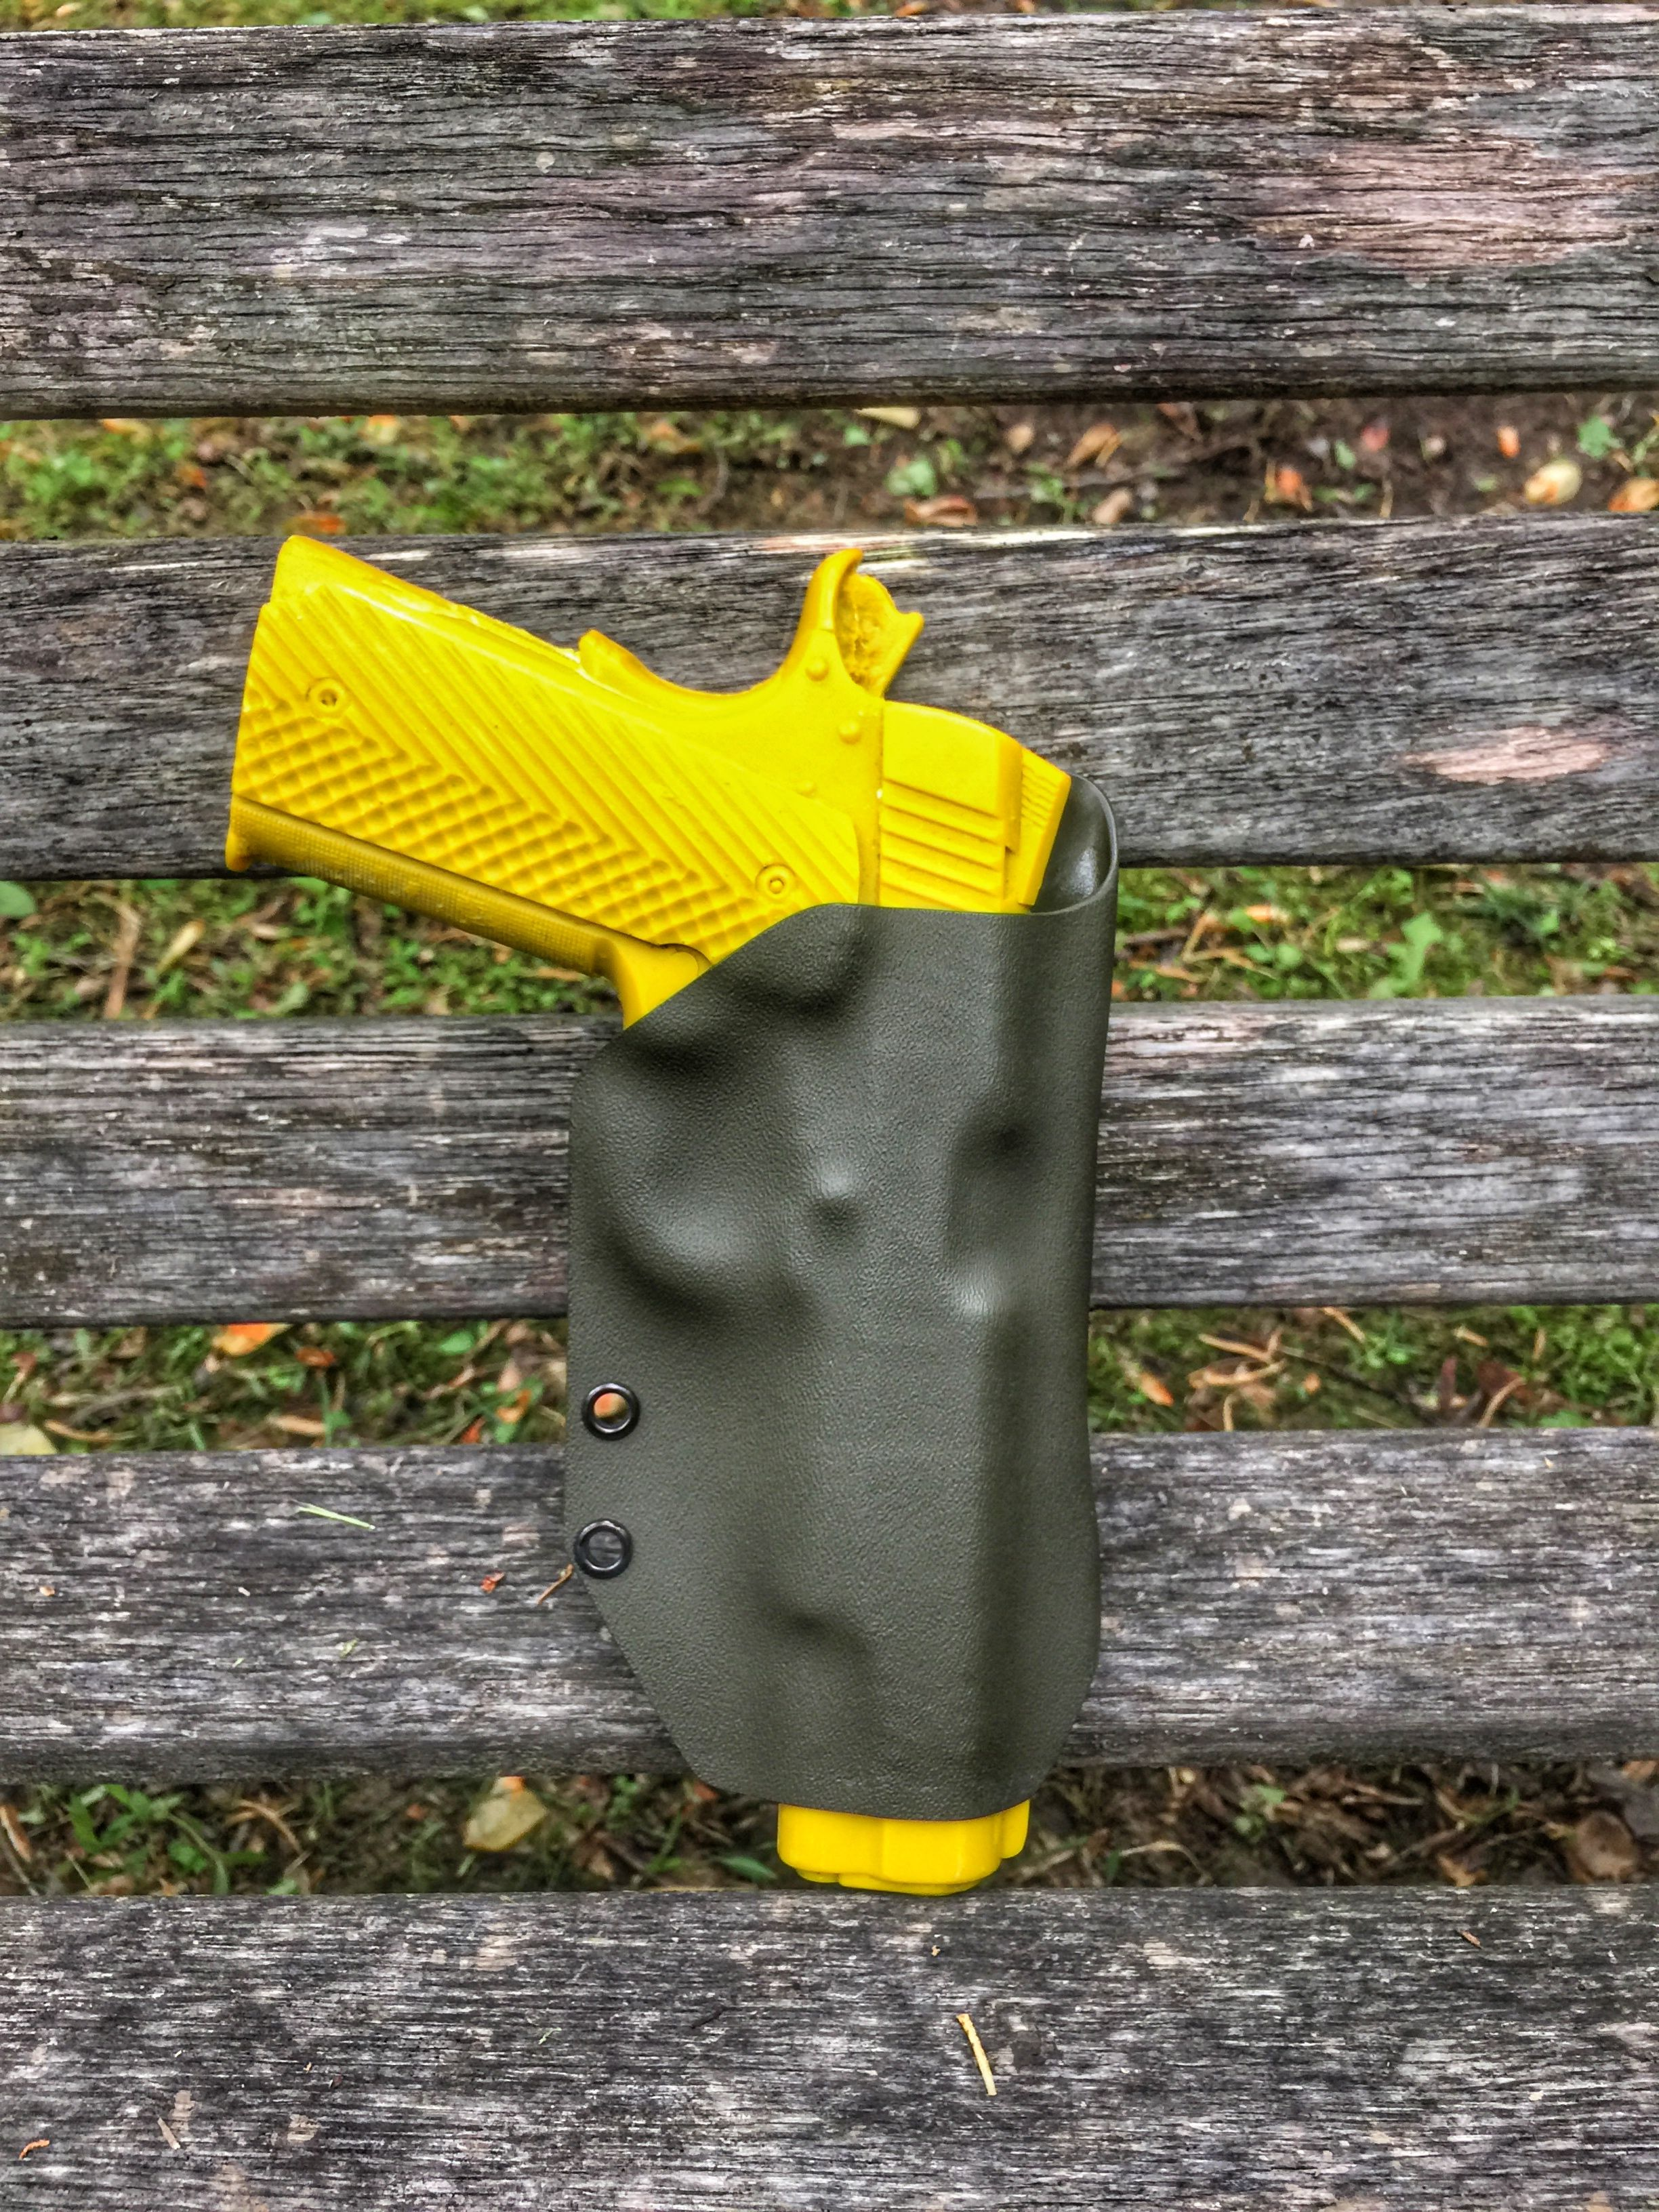 Finished olive drab kydex owb holster with a teklok clip